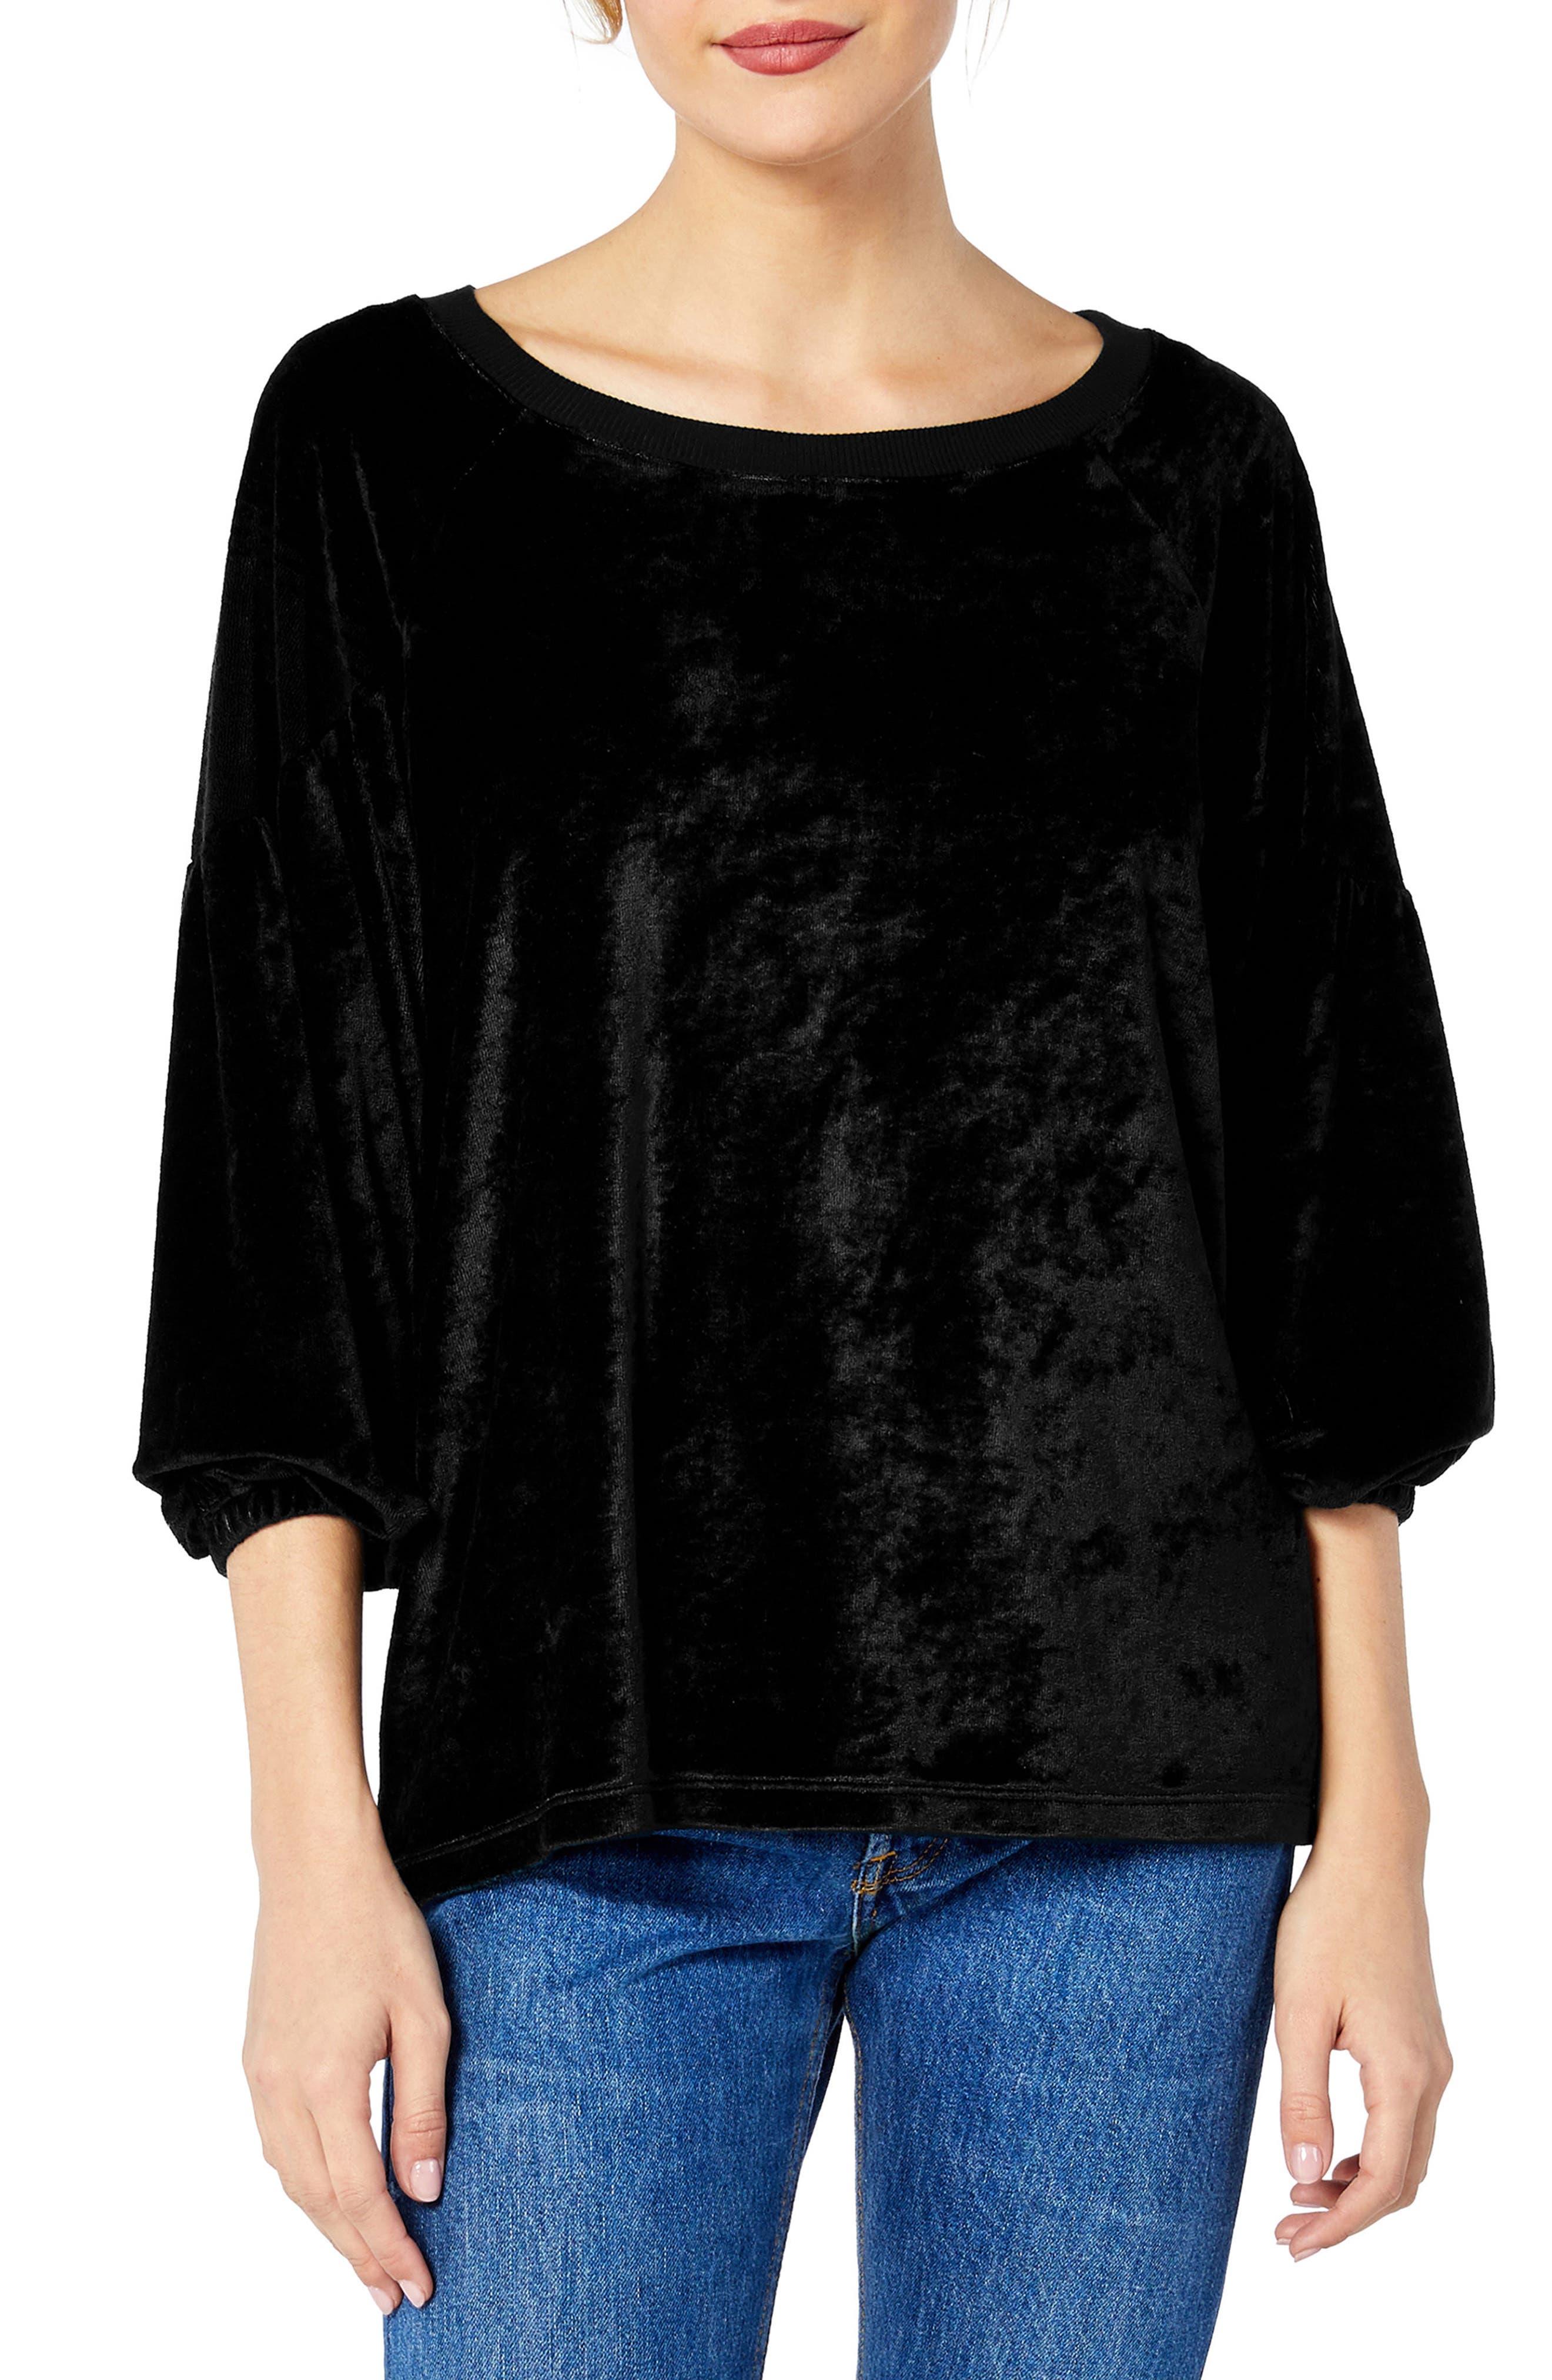 Vali Velvet Balloon Sleeve Convertible Top,                         Main,                         color, BLACK